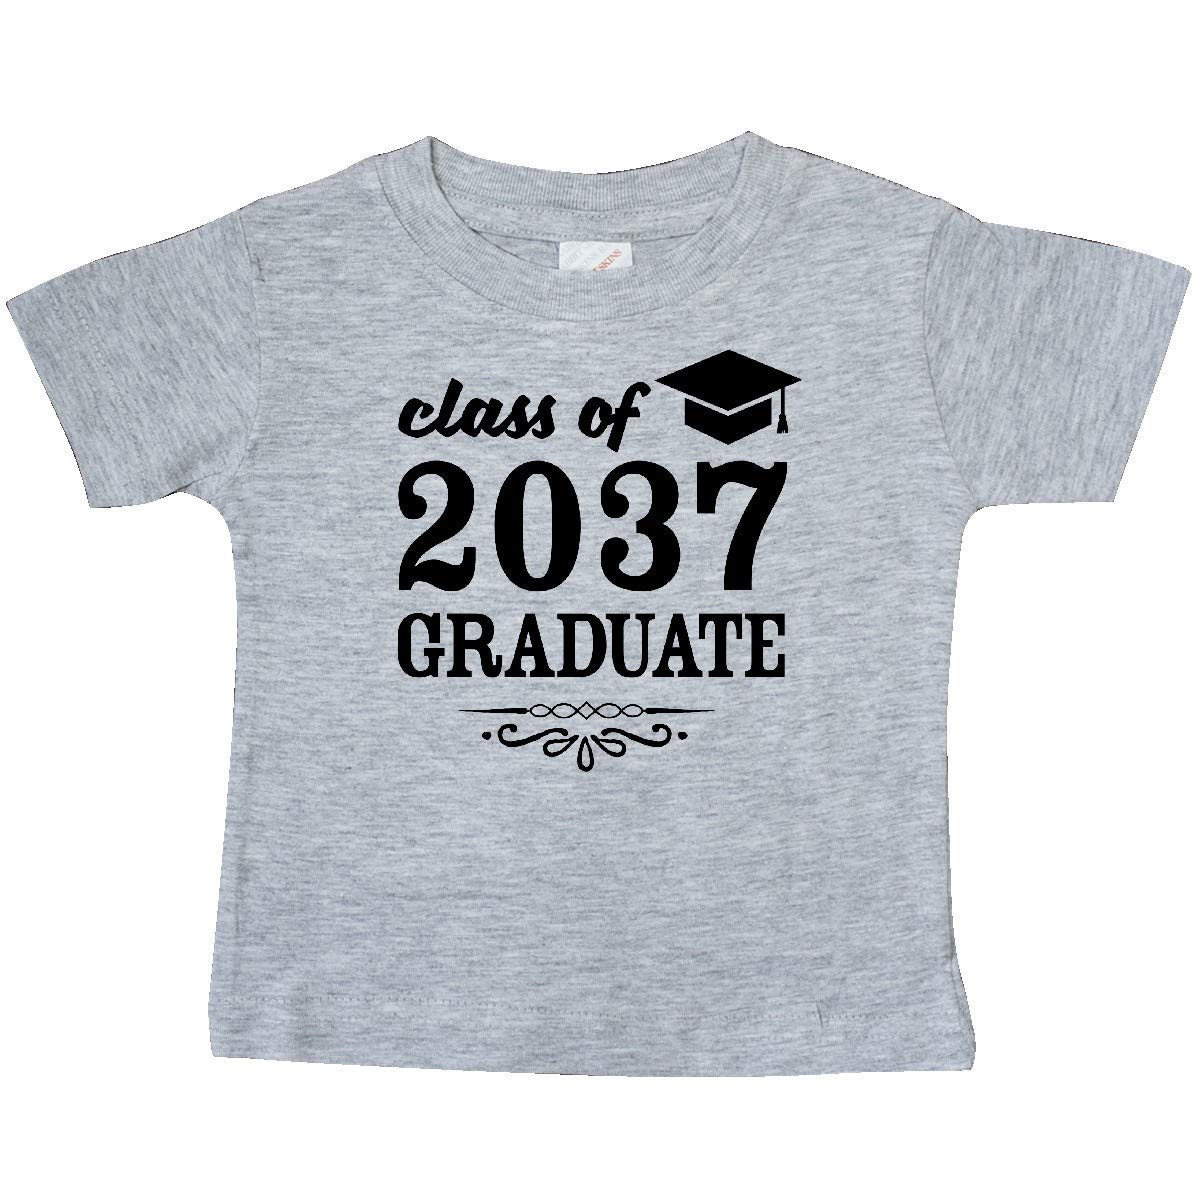 inktastic Class of 2037 Graduate with Graduation Cap Baby T-Shirt